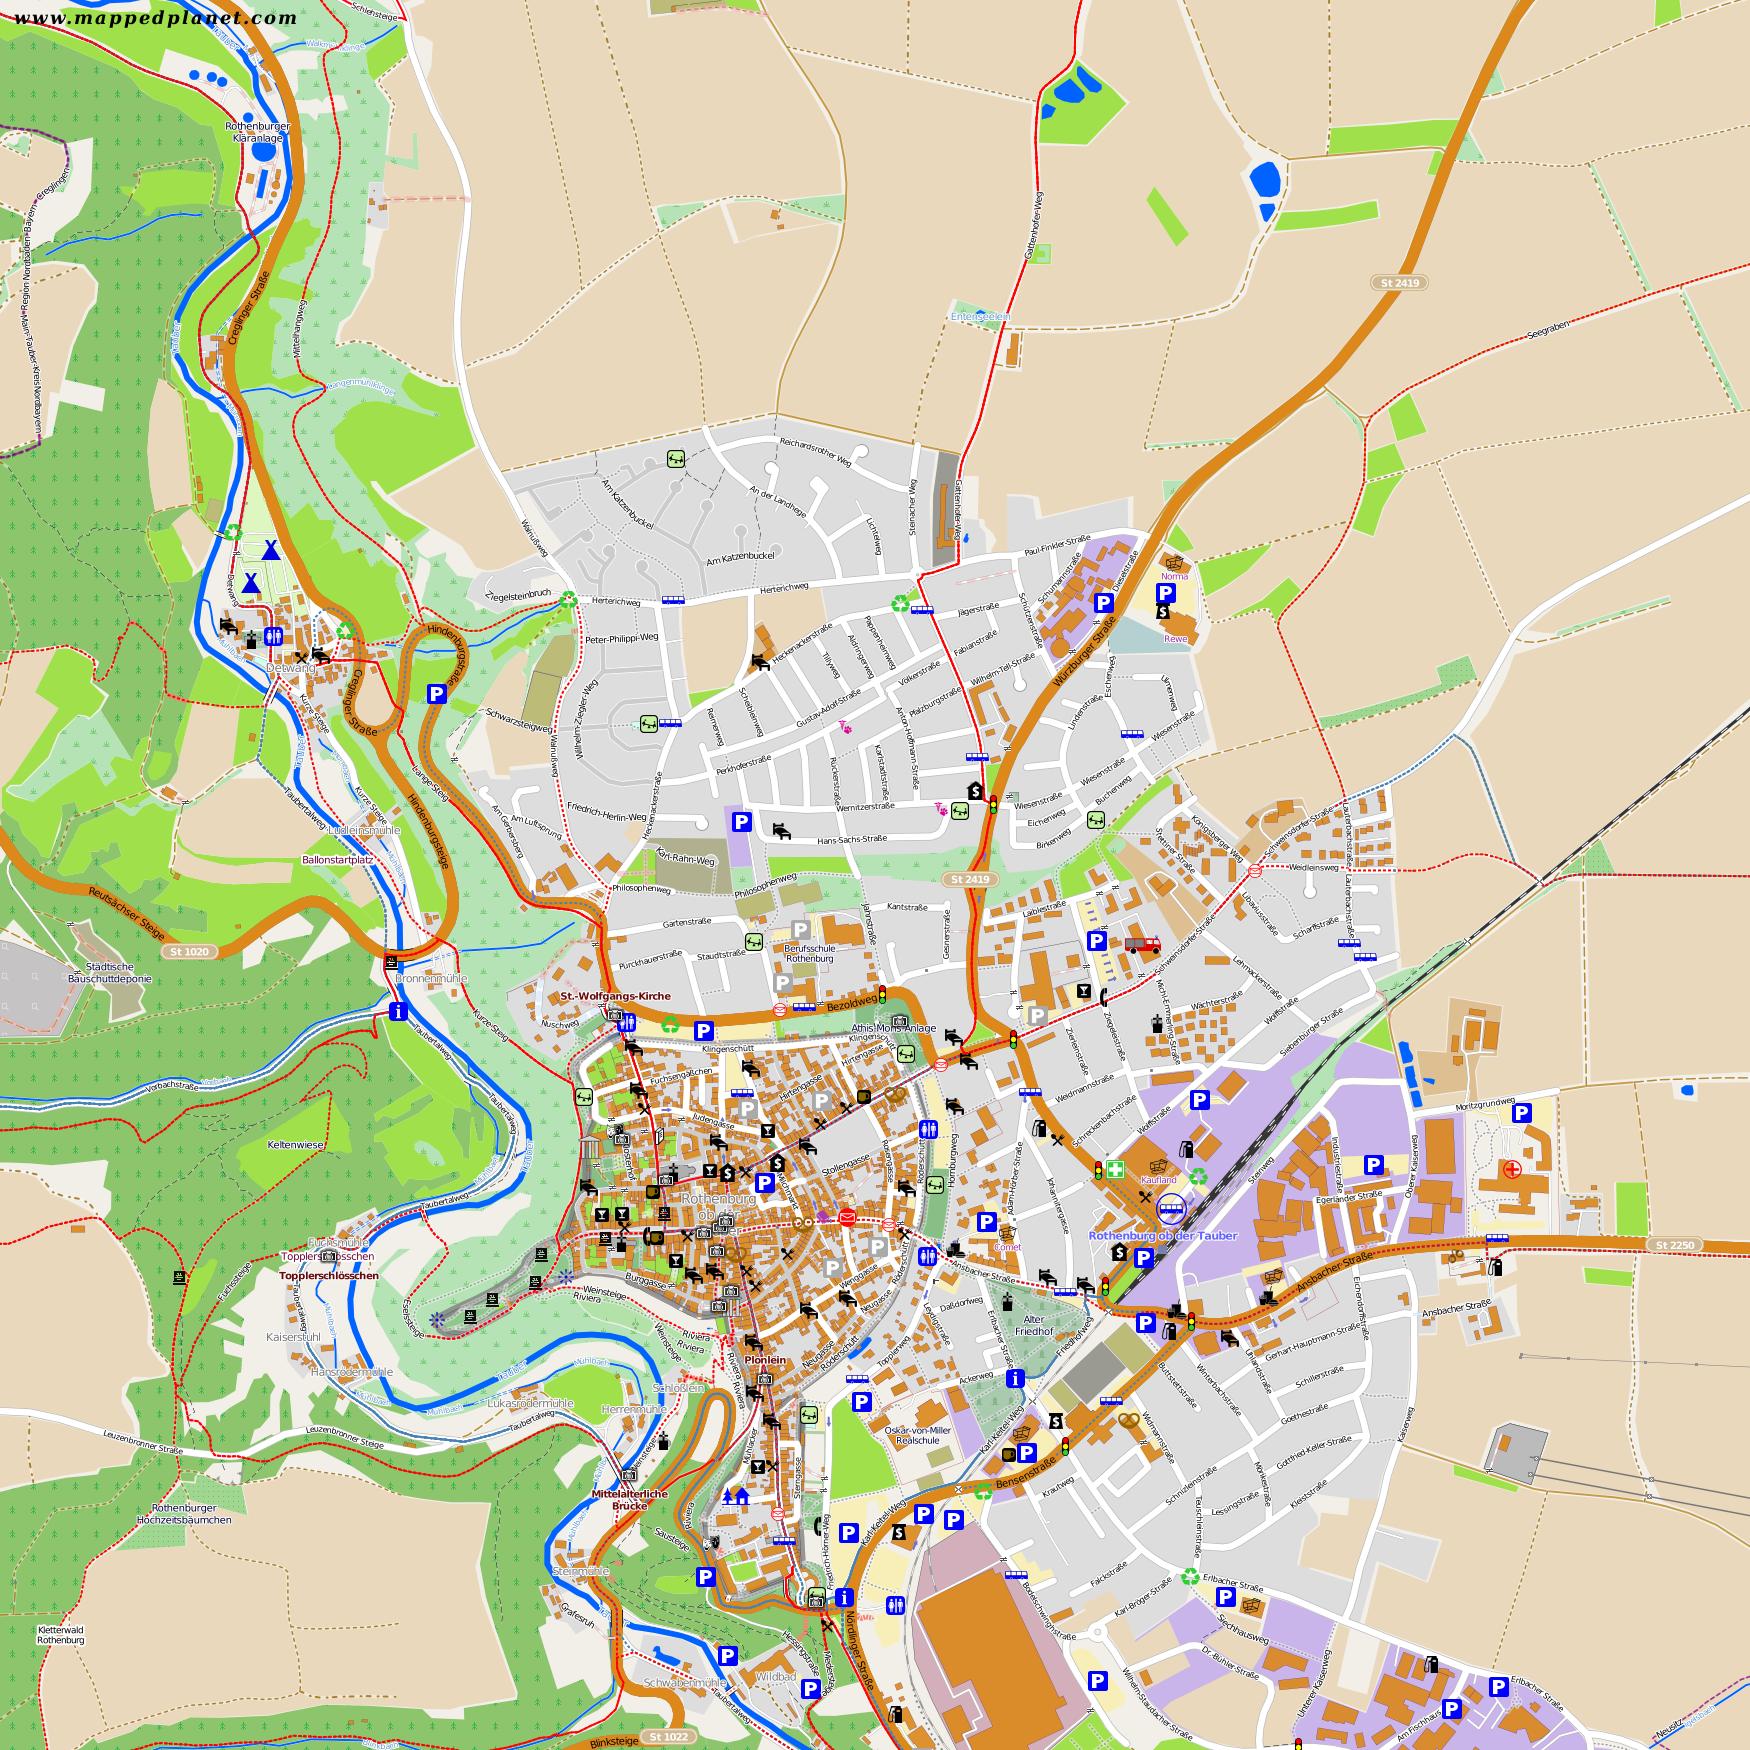 touristic map rothenburg ob der tauber